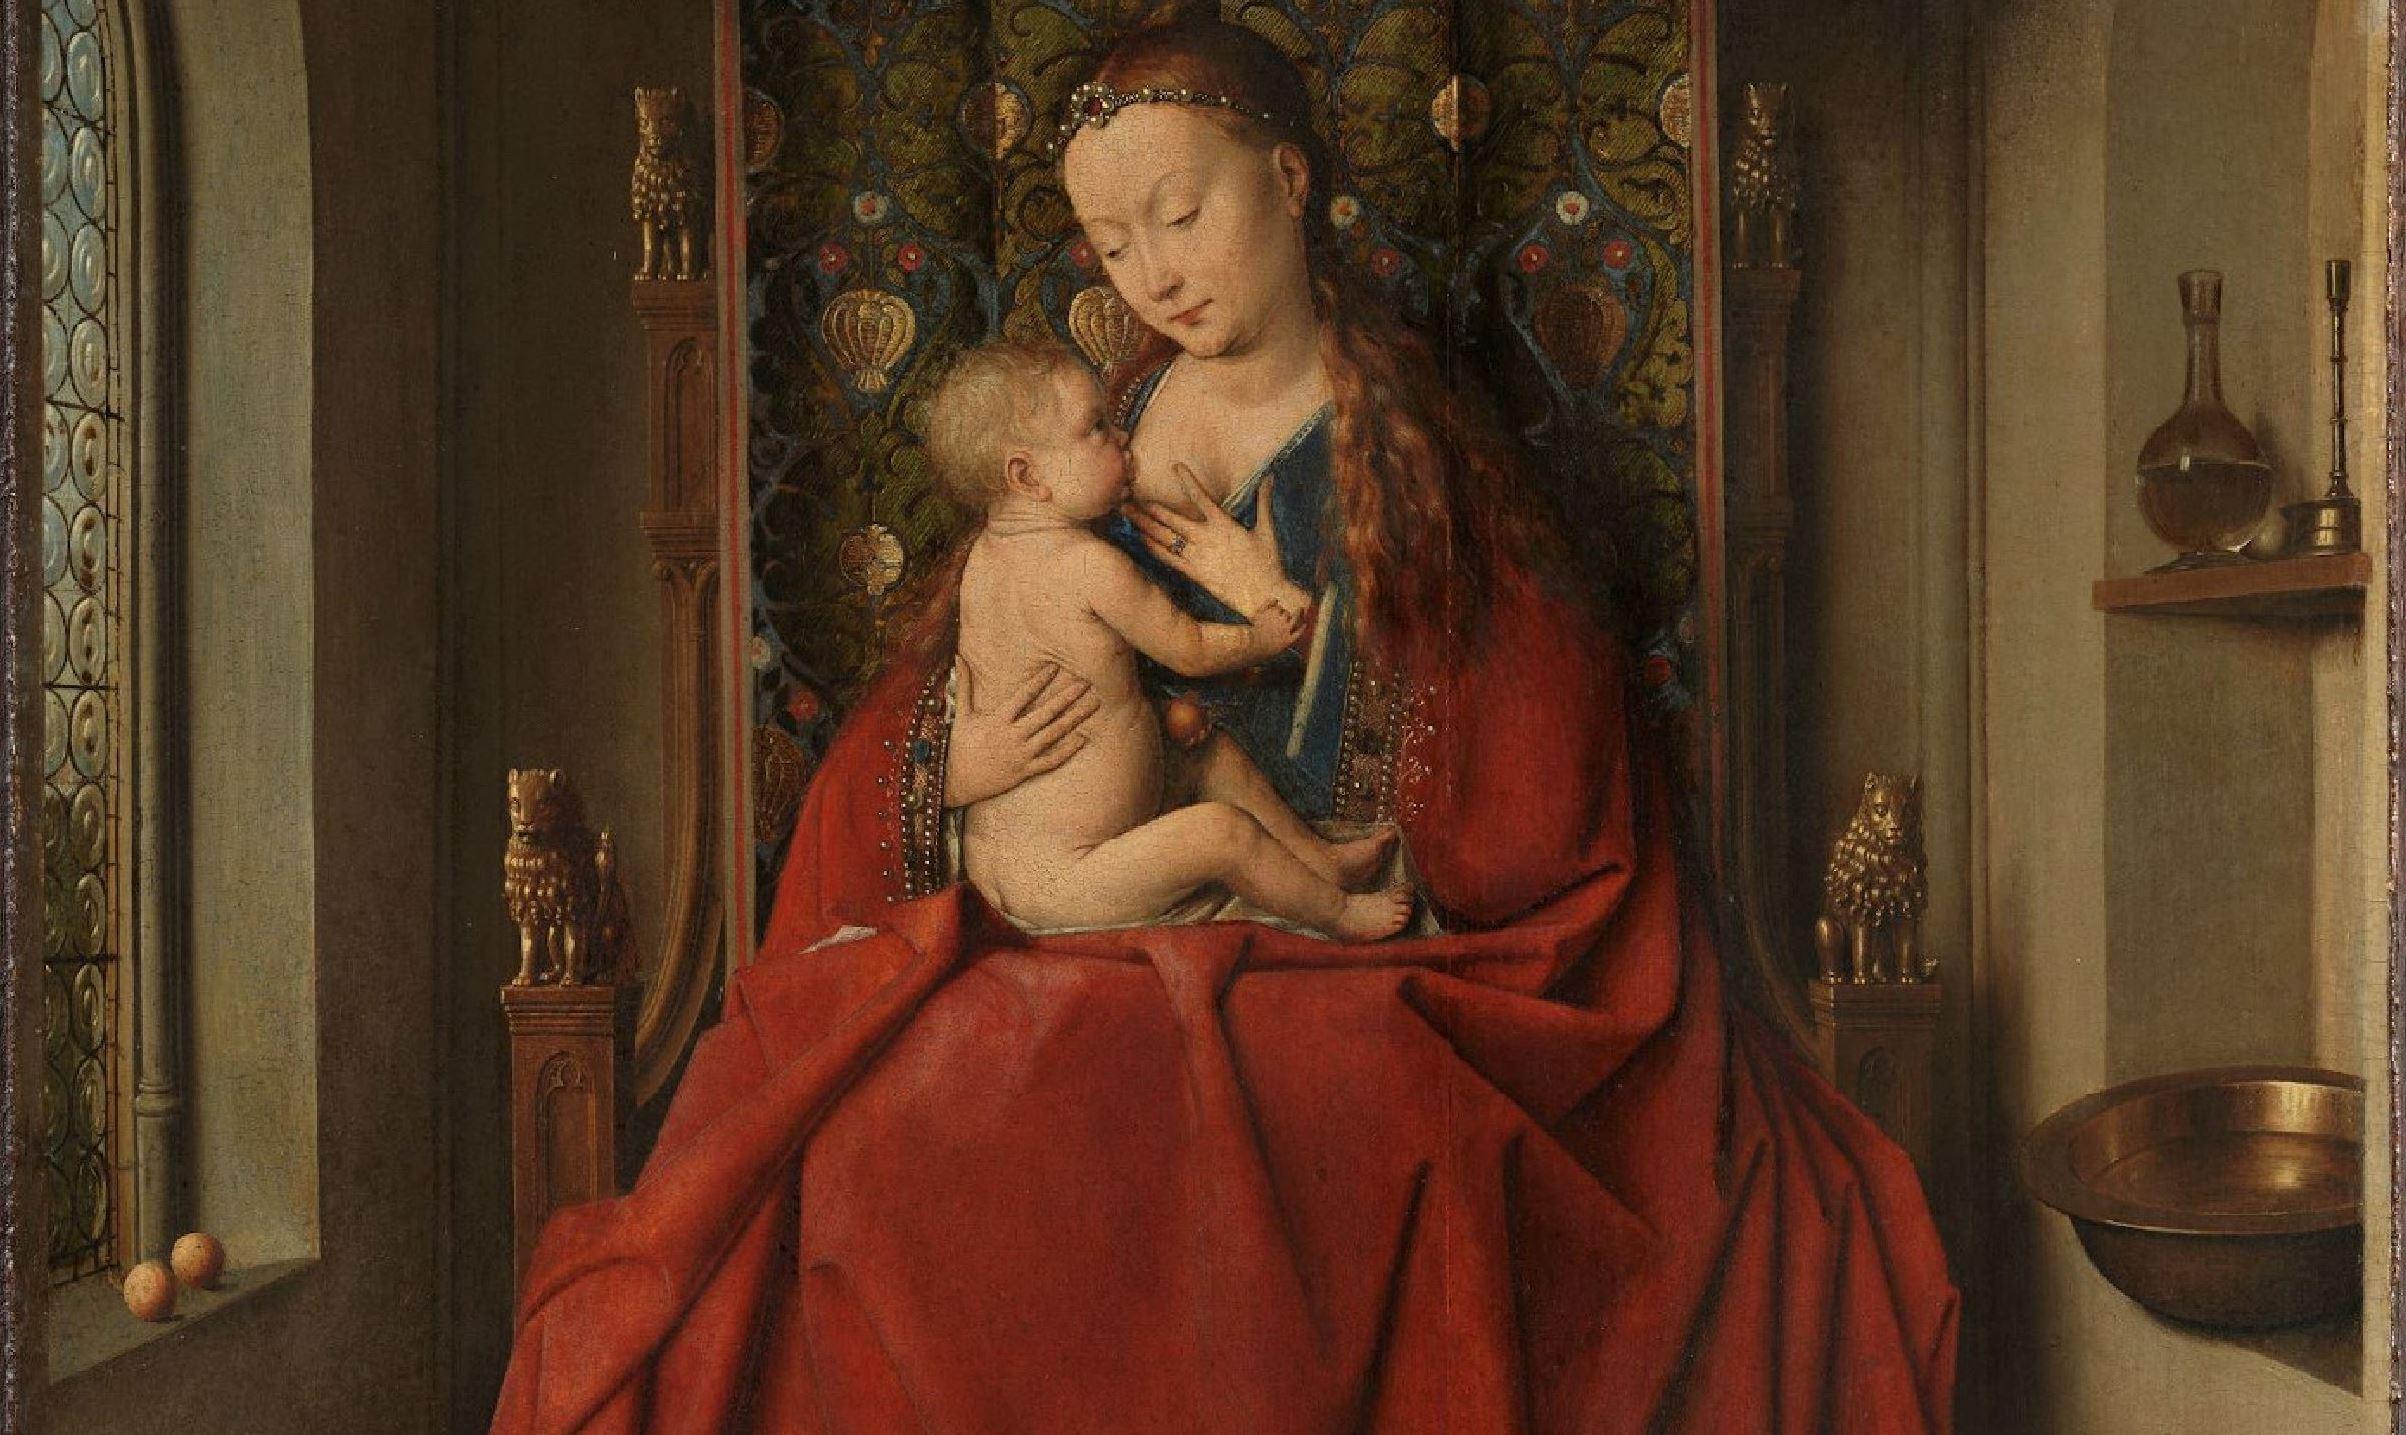 Van Eyck 1435-40 Vierge de Lucques detail Staedel Museum Francfort